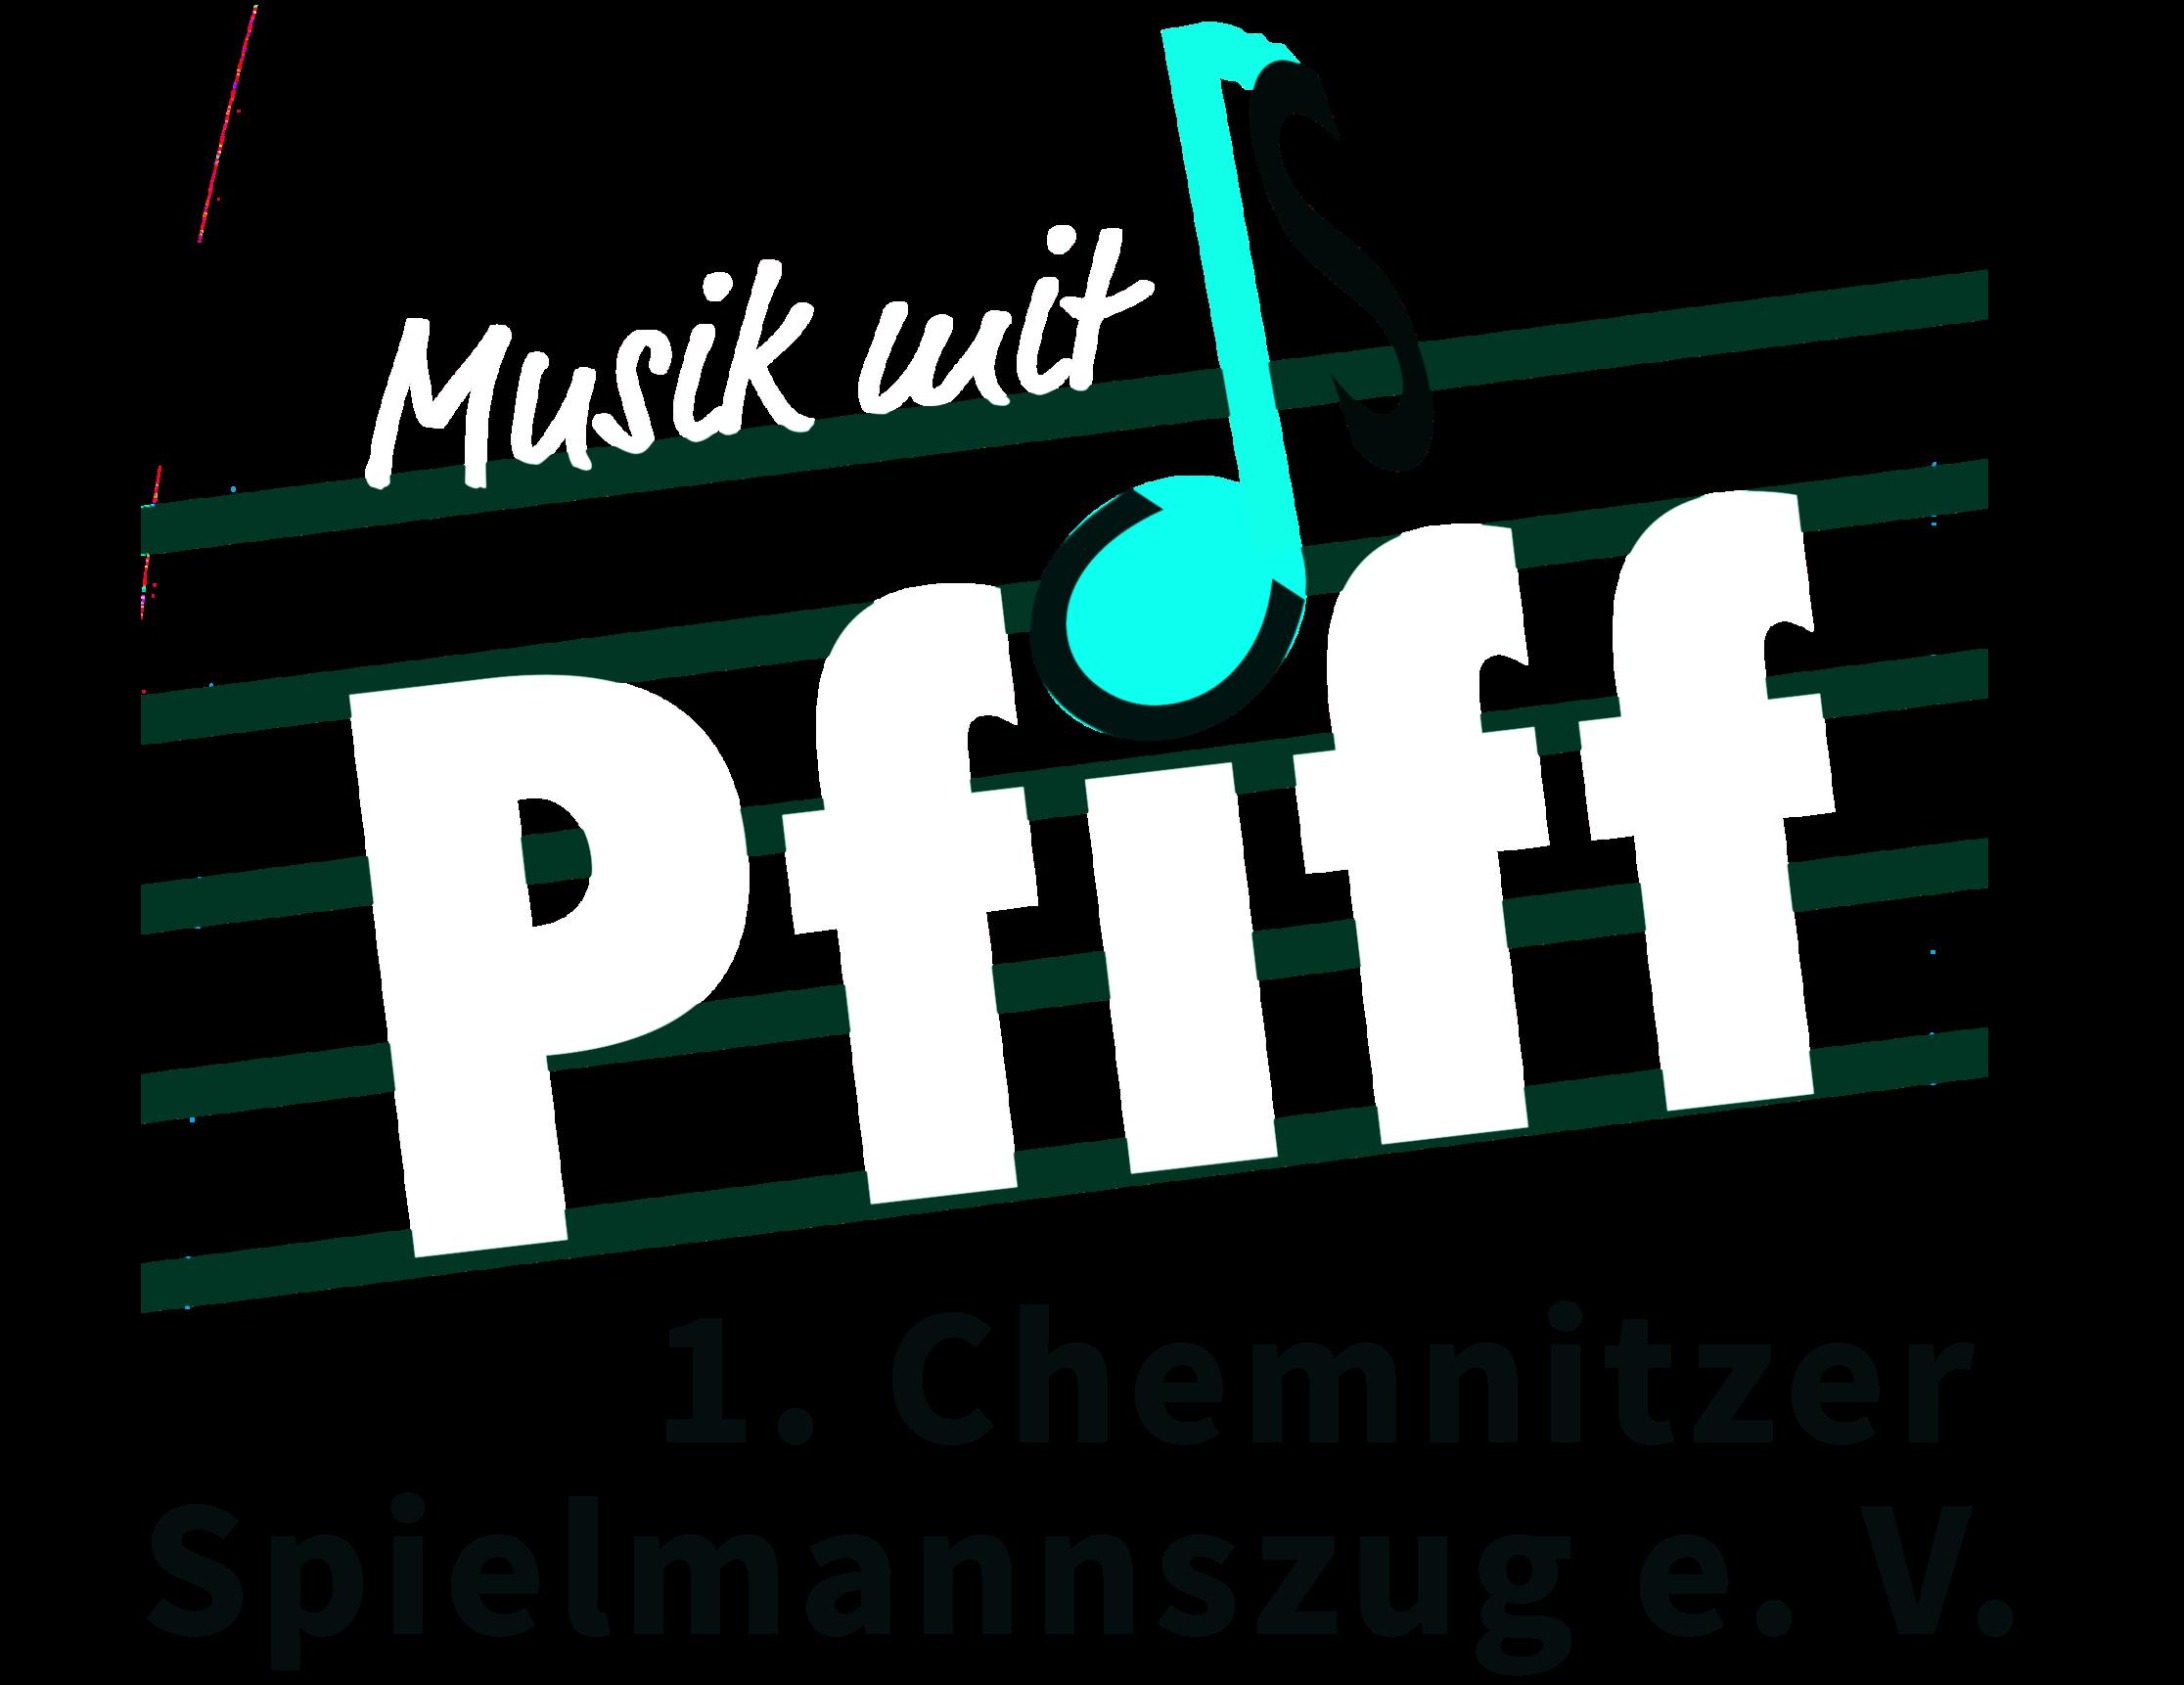 1. Chemnitzer Spielmannszug e.V.